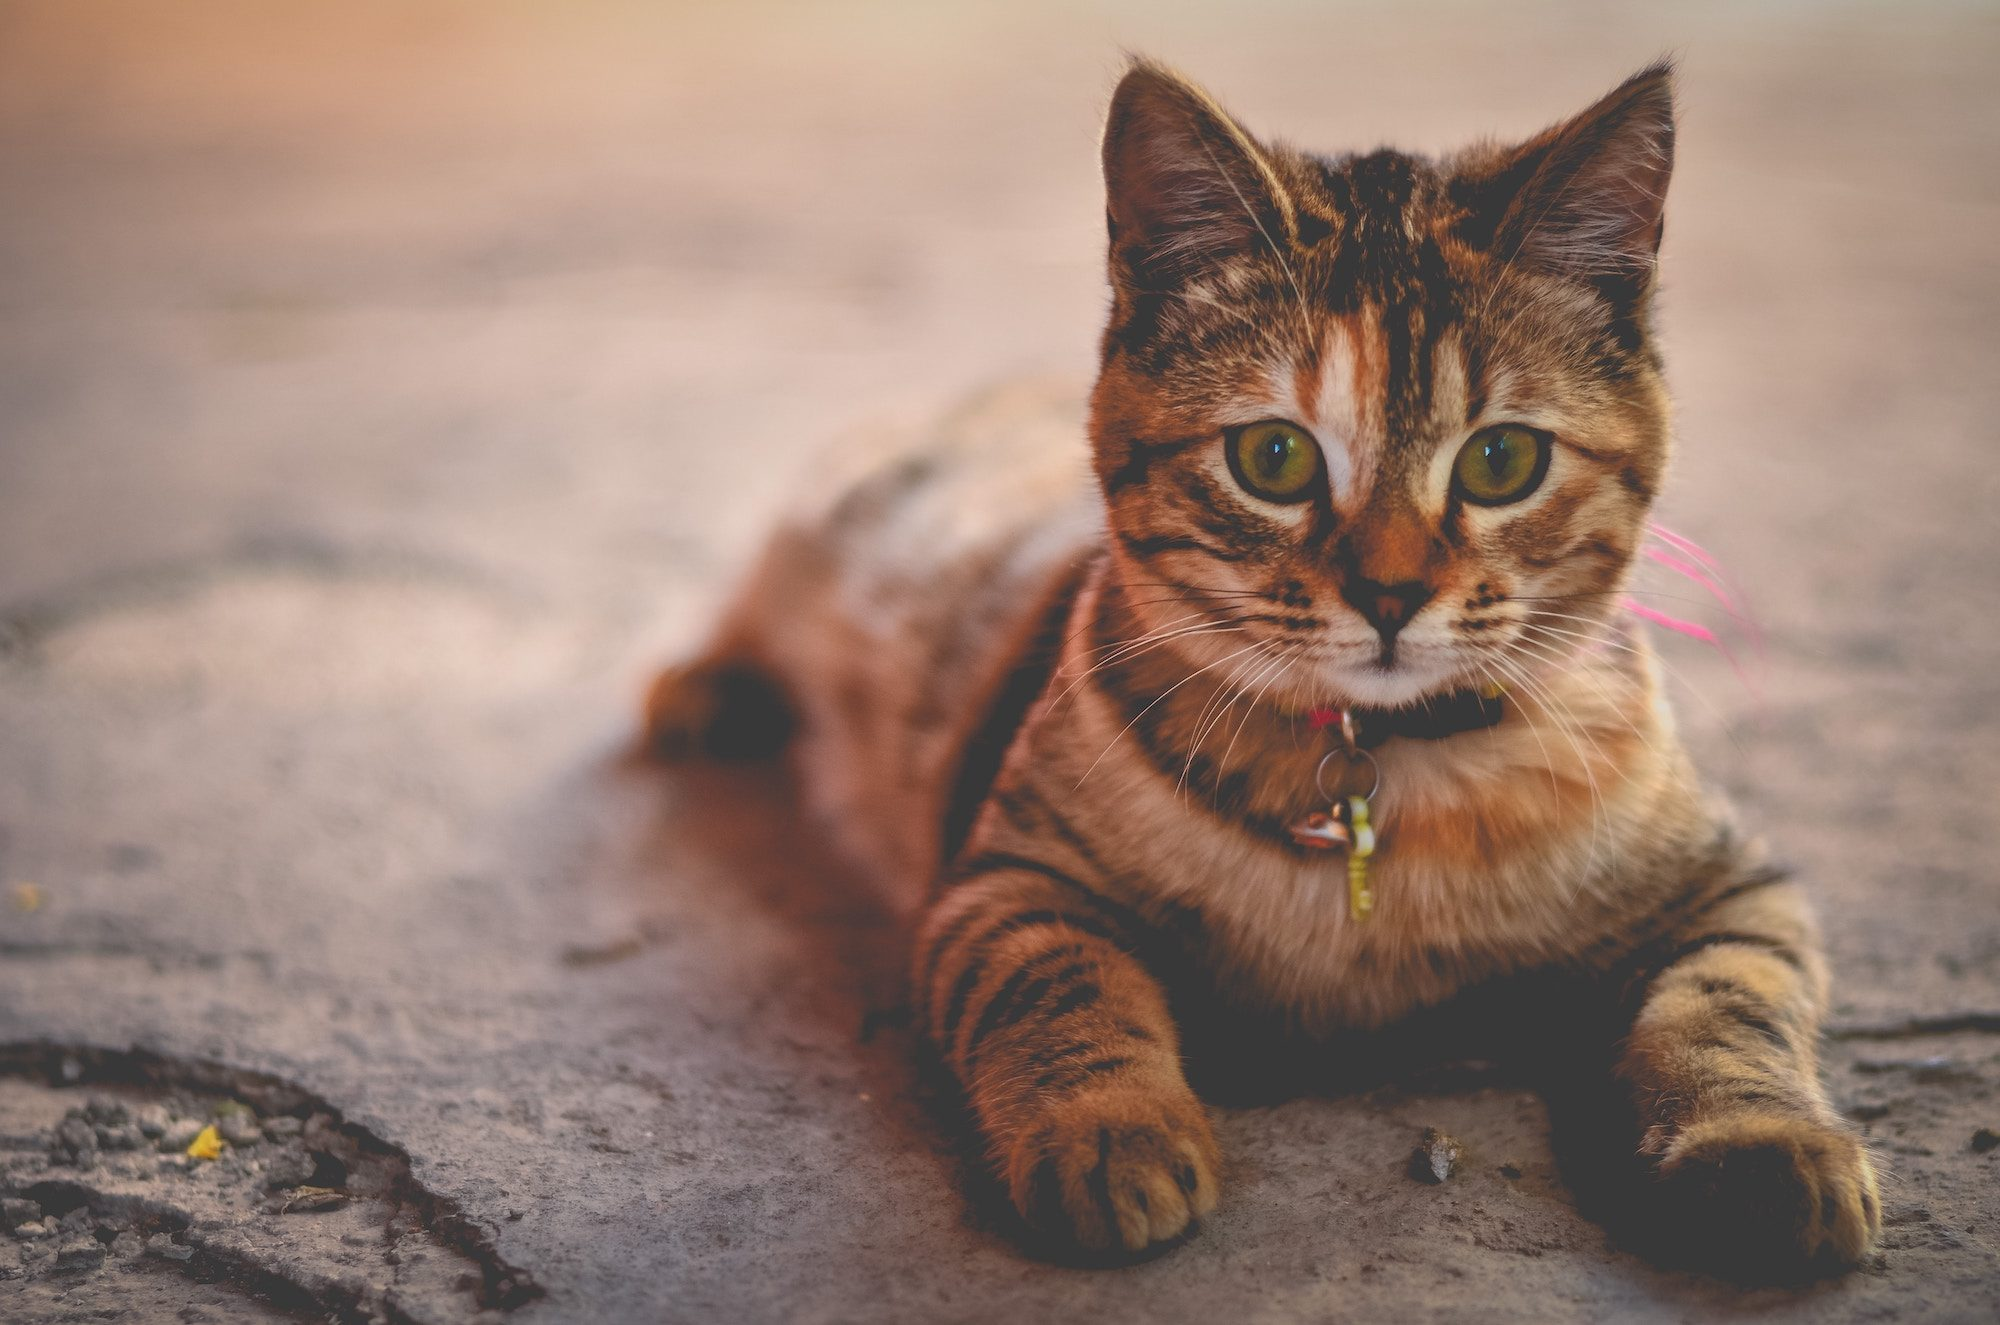 Cute striped black and brown kitten lying on the floor, looking ahead like a Sphinx